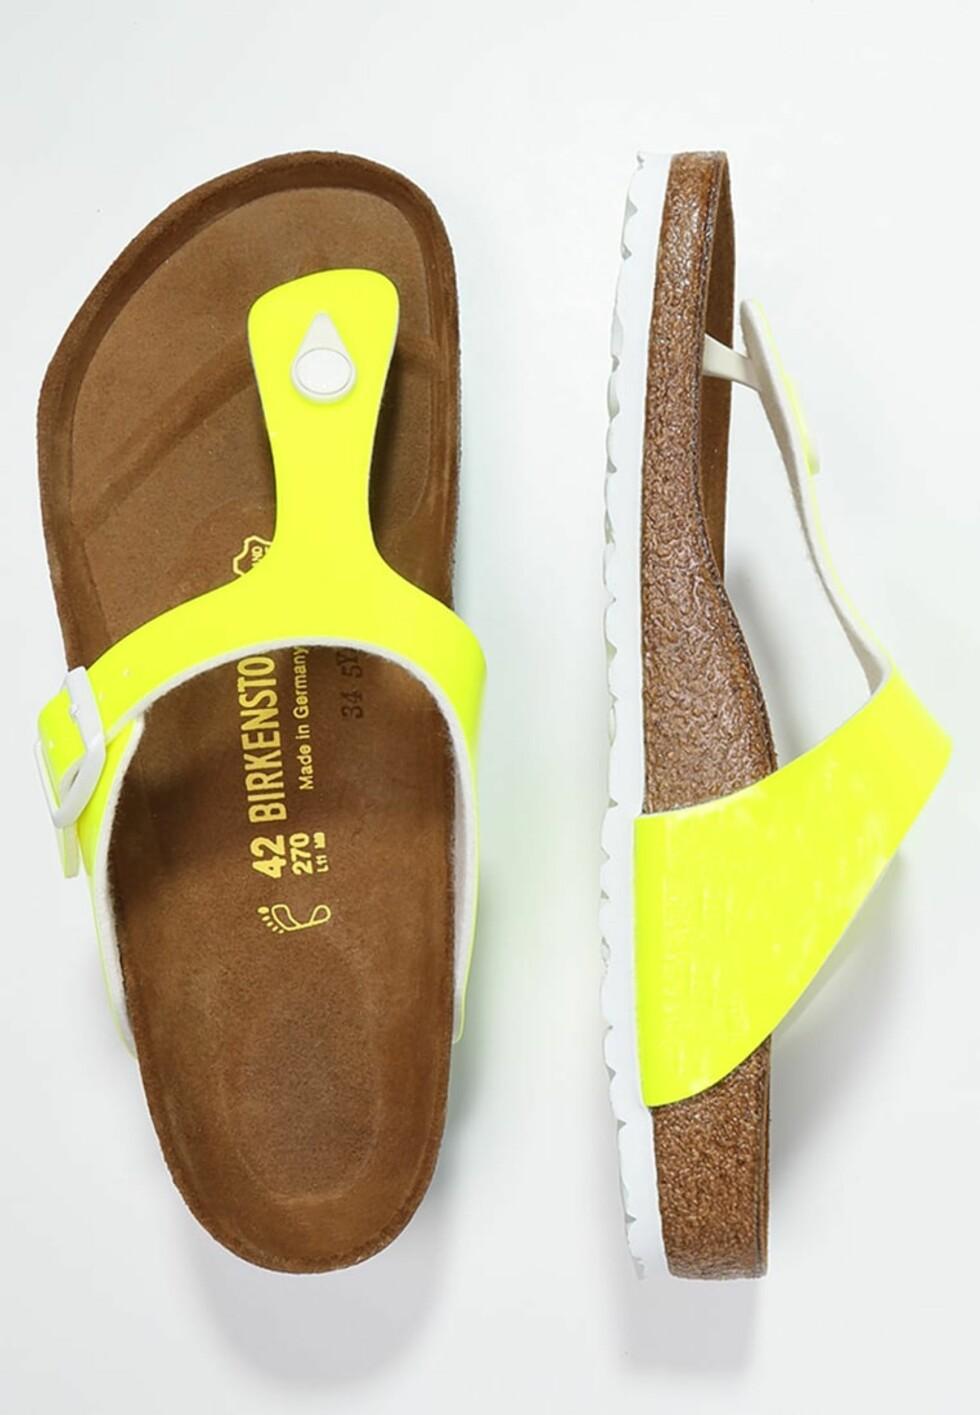 Sandaler fra Birkenstock via Zalando.no | kr 799 | pn.zalando.net/go.cgi?pid=1173&wmid=cc&cpid=12&target=http://www.zalando.no/birkenstock-gizeh-flip-flops-neon-yellow-bi111z01h-e11.html